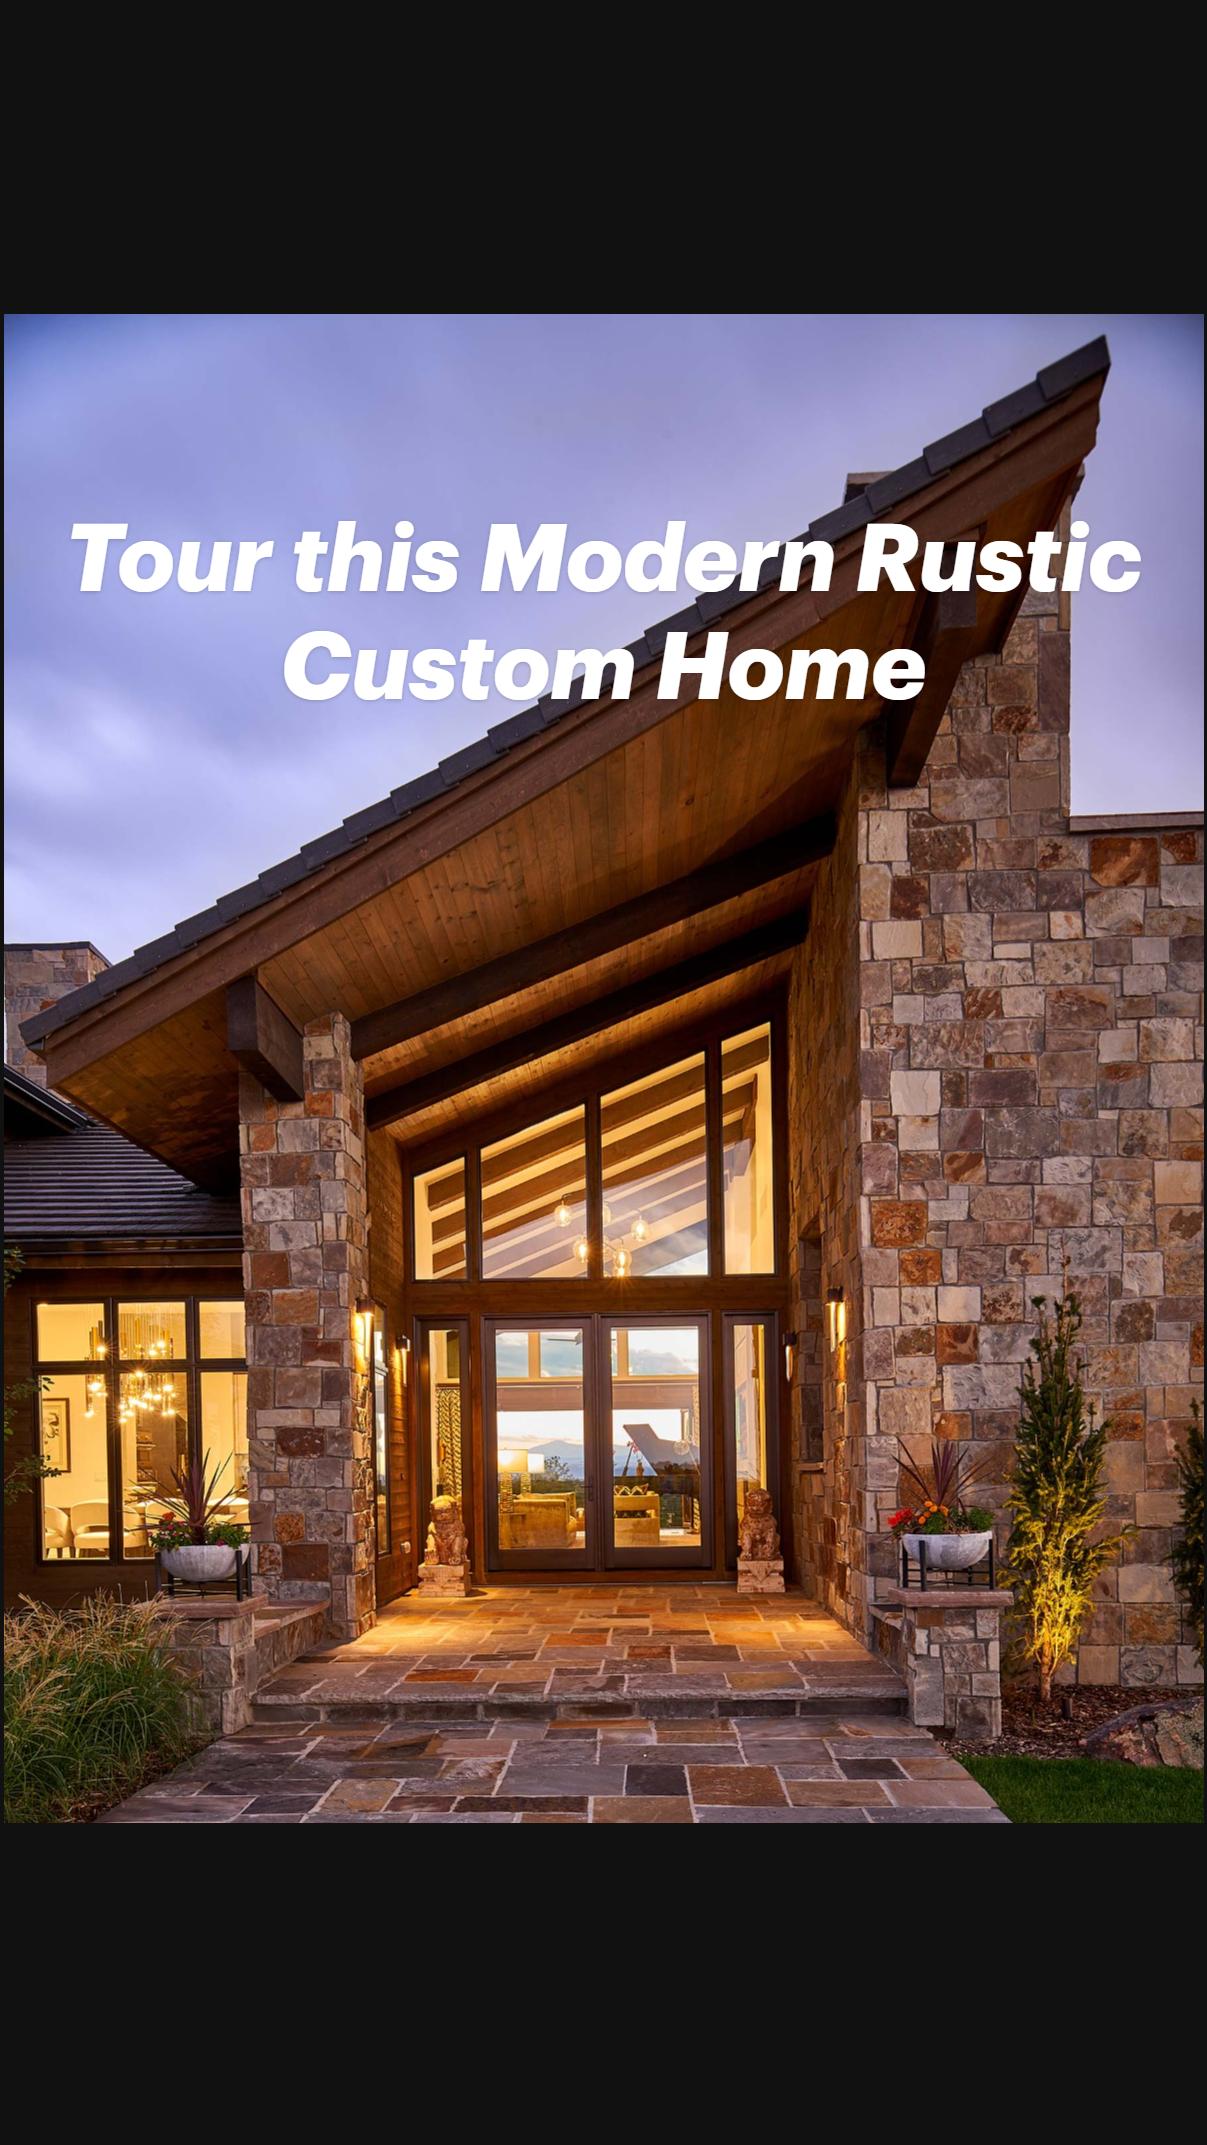 Tour this Modern Rustic Custom Home in Colorado Golf Club